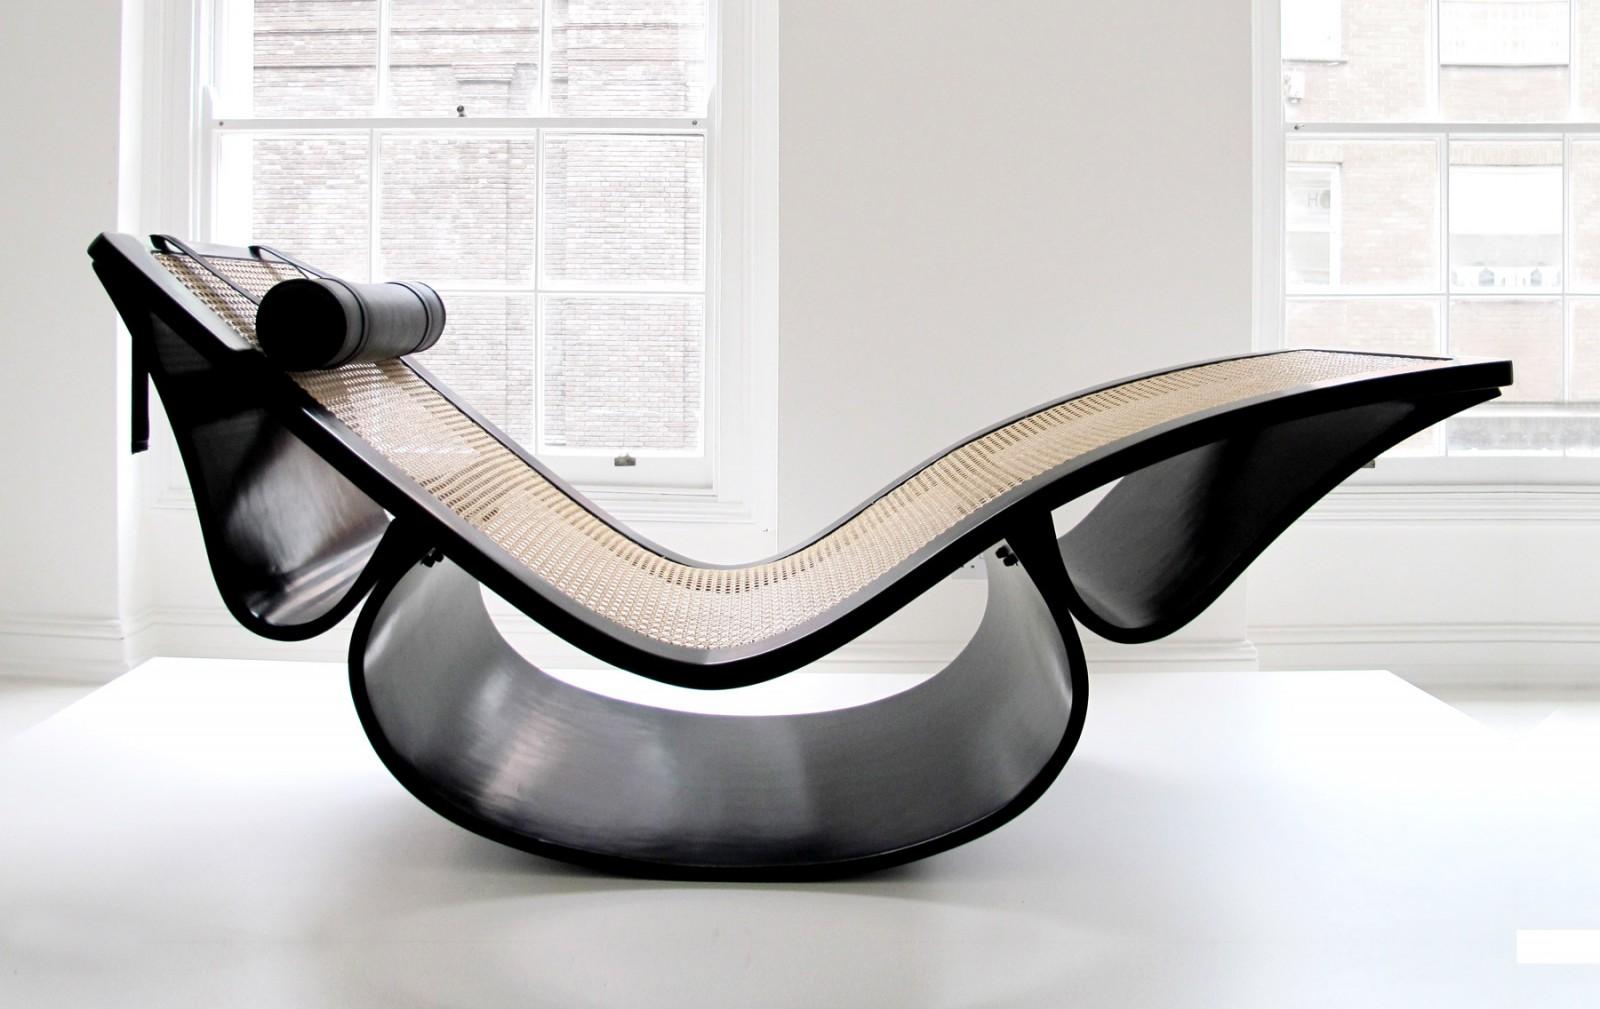 8-Chaise-Longue-Rio-Oscar-Niemeyer